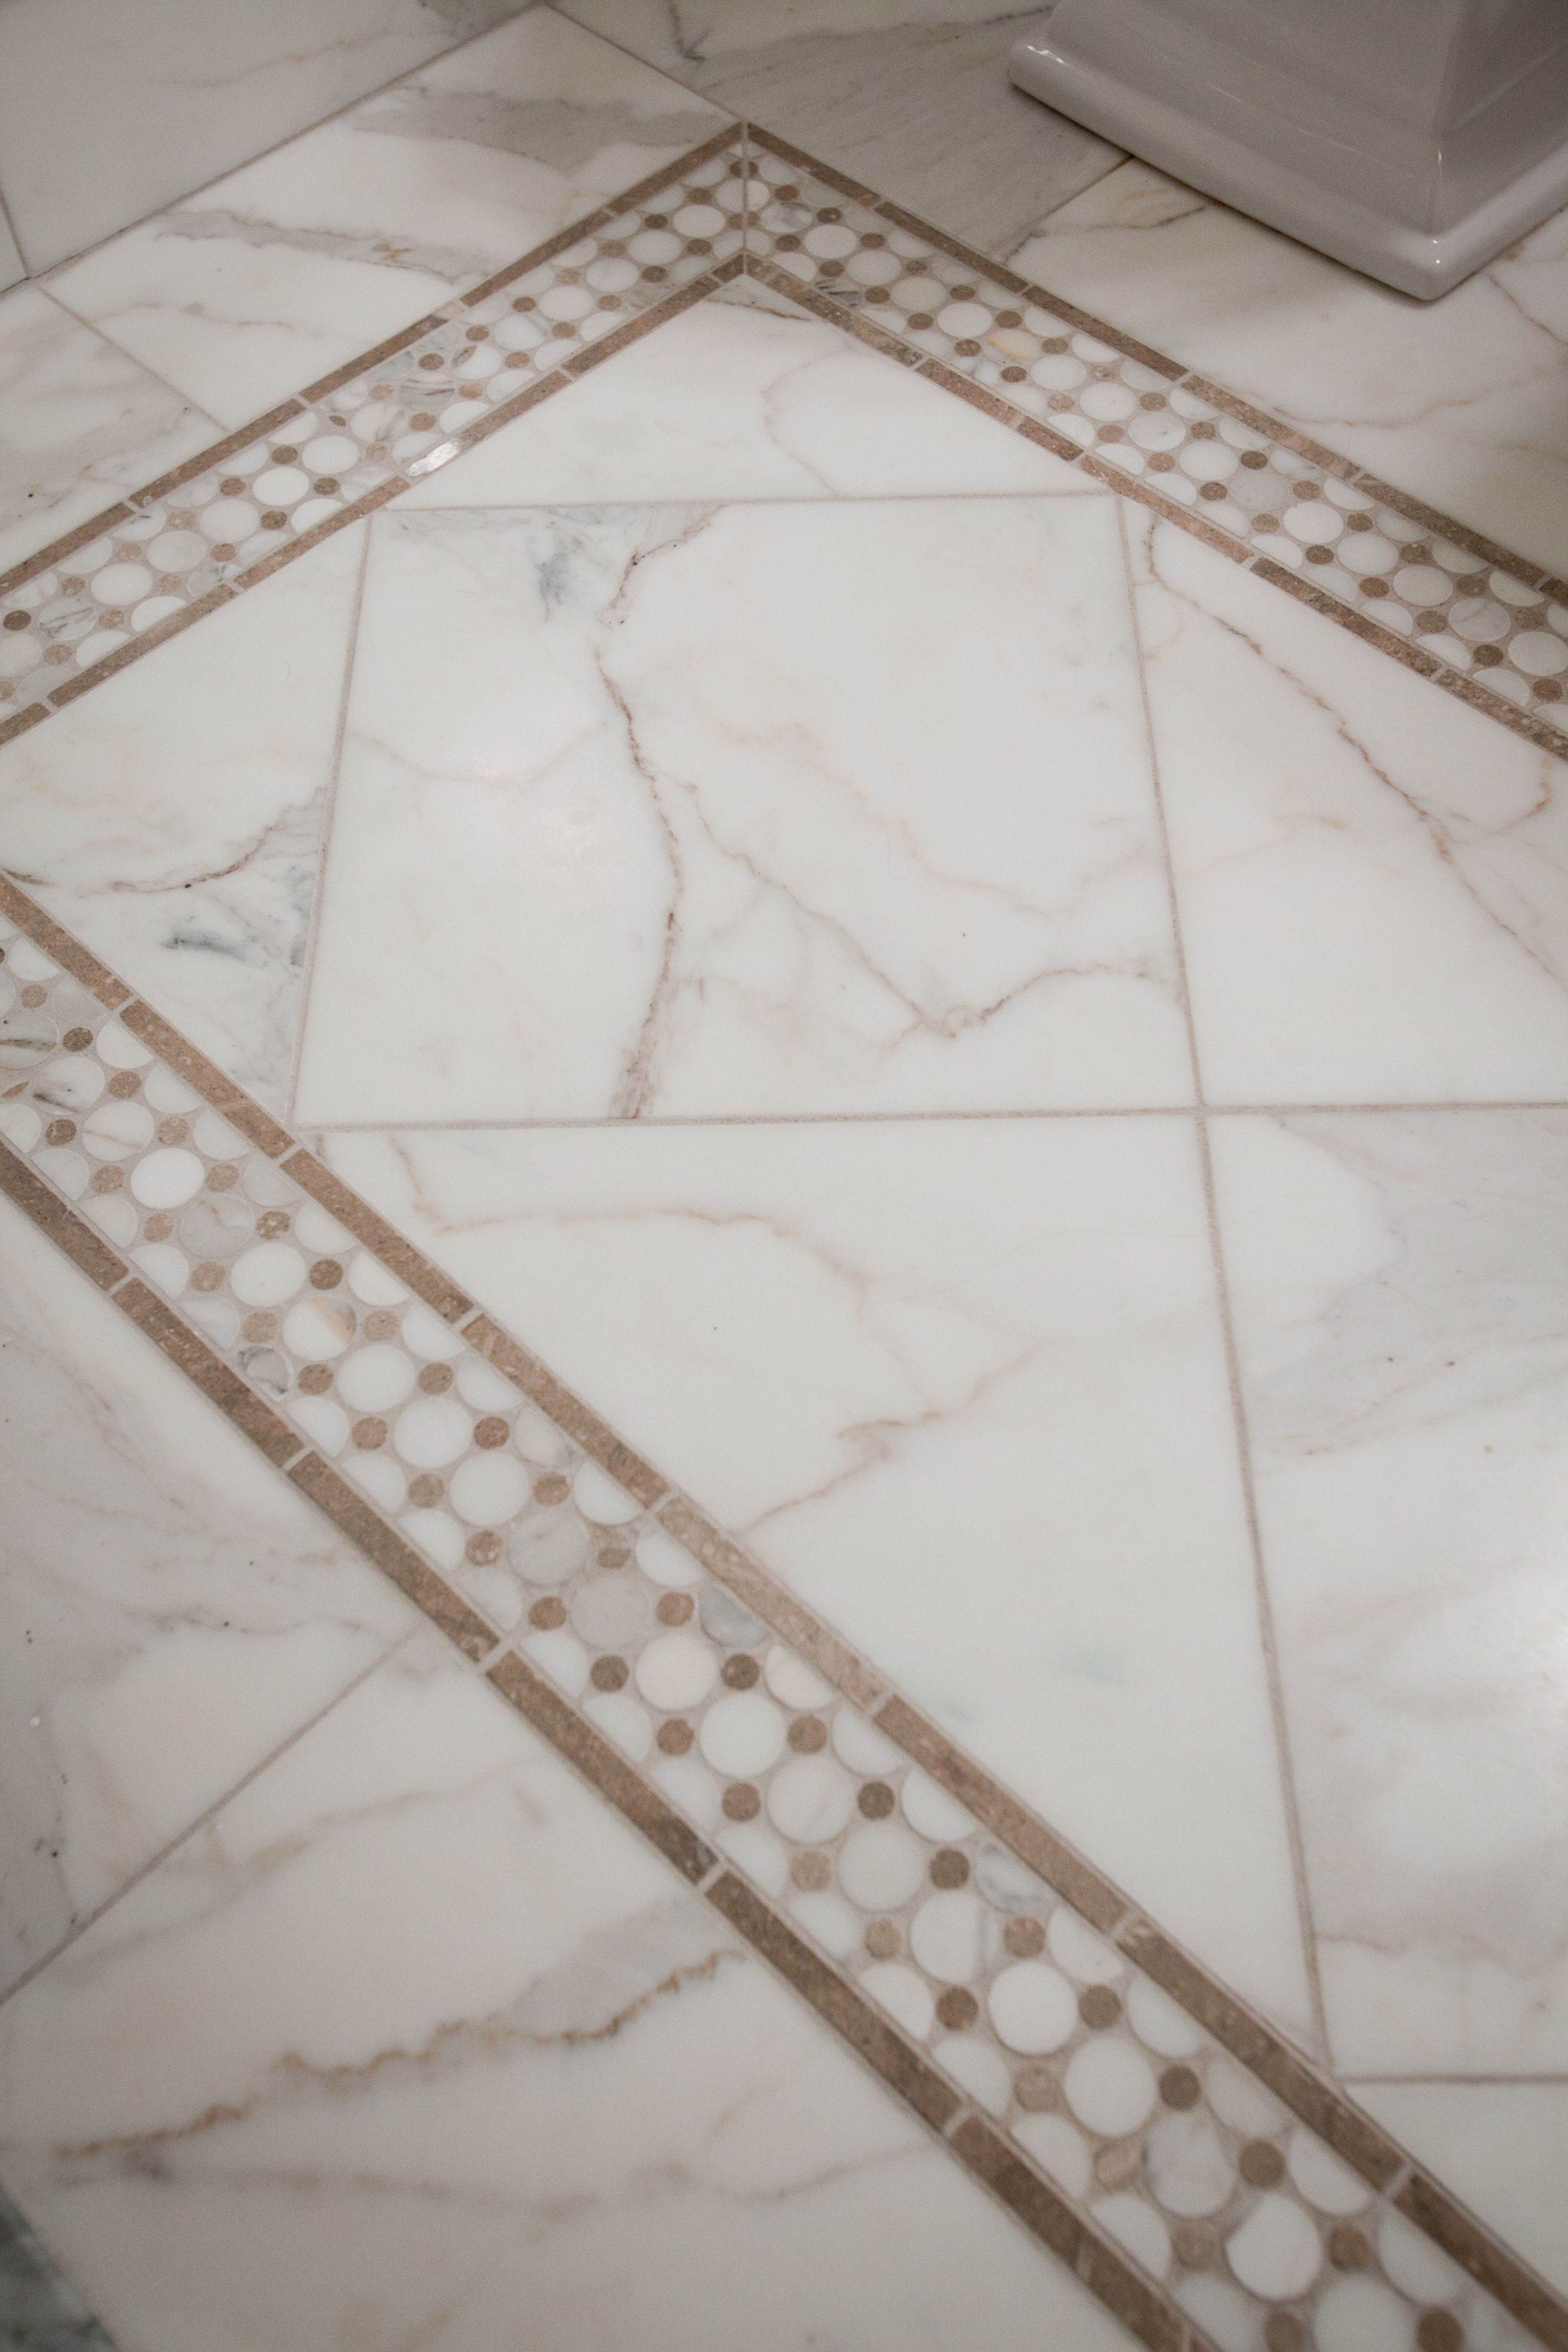 45 Design Bathroom Flooring Ideas Vinyl Tiles Inspirations Neat Fast Tile Rug Floor Tile Design Kitchen Flooring